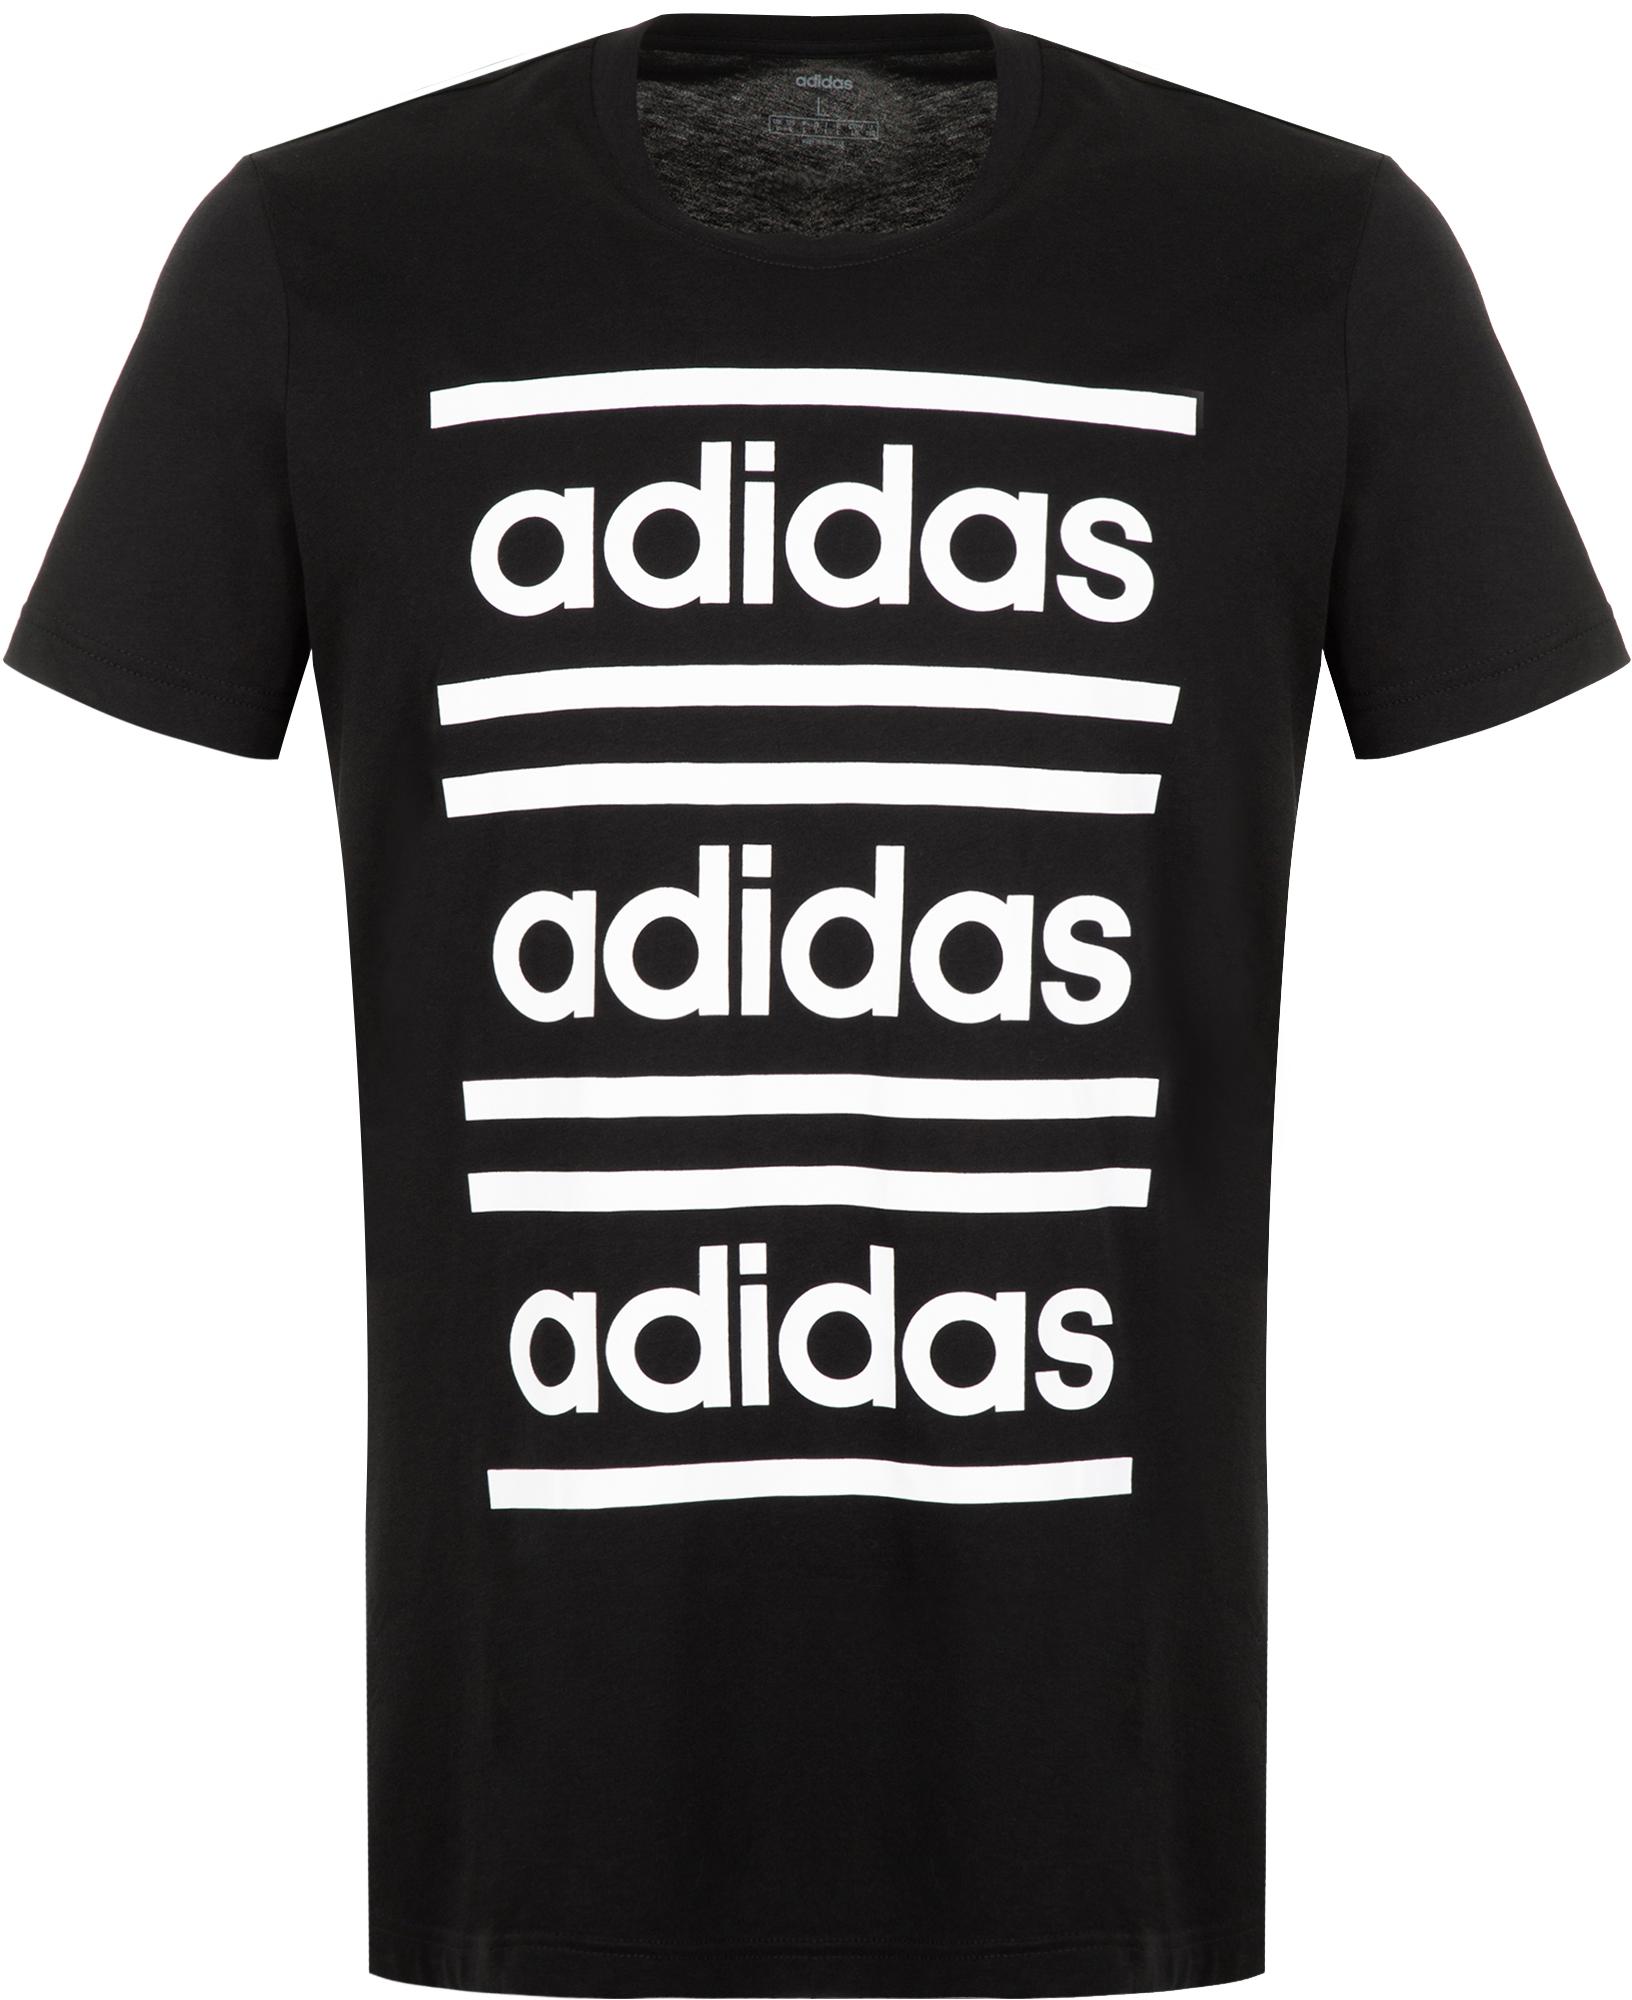 Adidas Футболка мужская Celebrate the 90s, размер 56